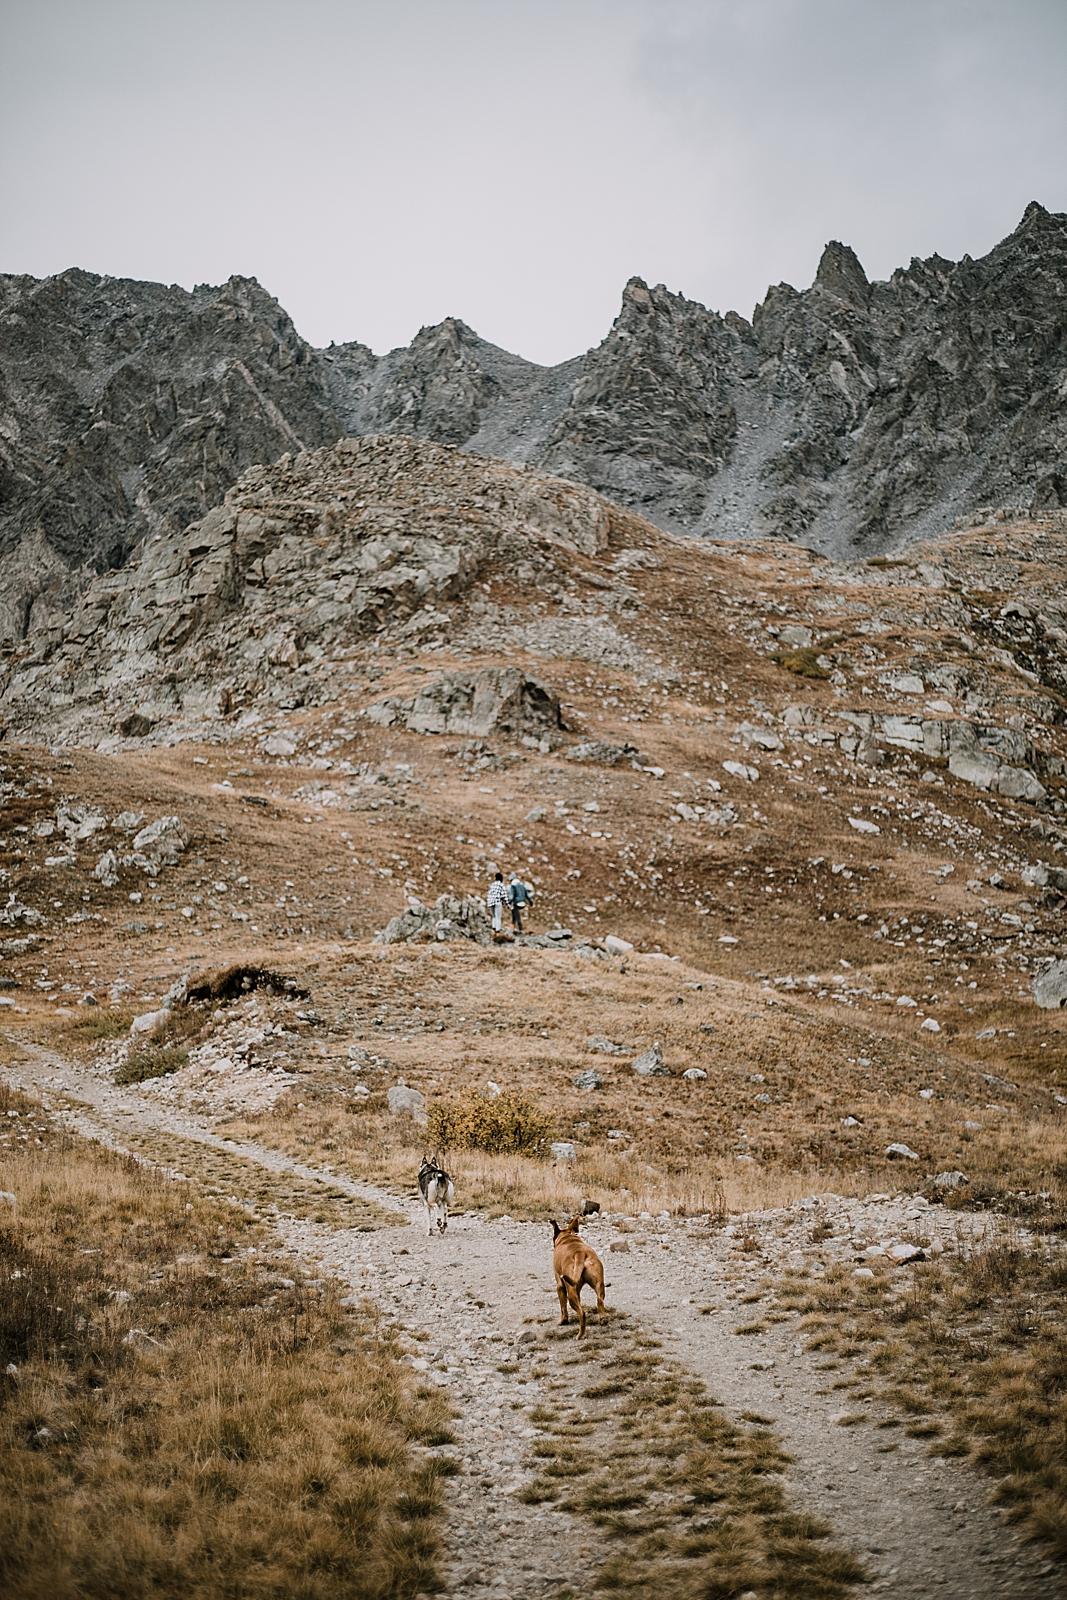 dogs running up mountain, colorado surprise proposal, hike mayflower gulch, mayflower gulch proposal, mayflower gulch elopement, mayflower gulch wedding, colorado mountainscape, leadville elopement